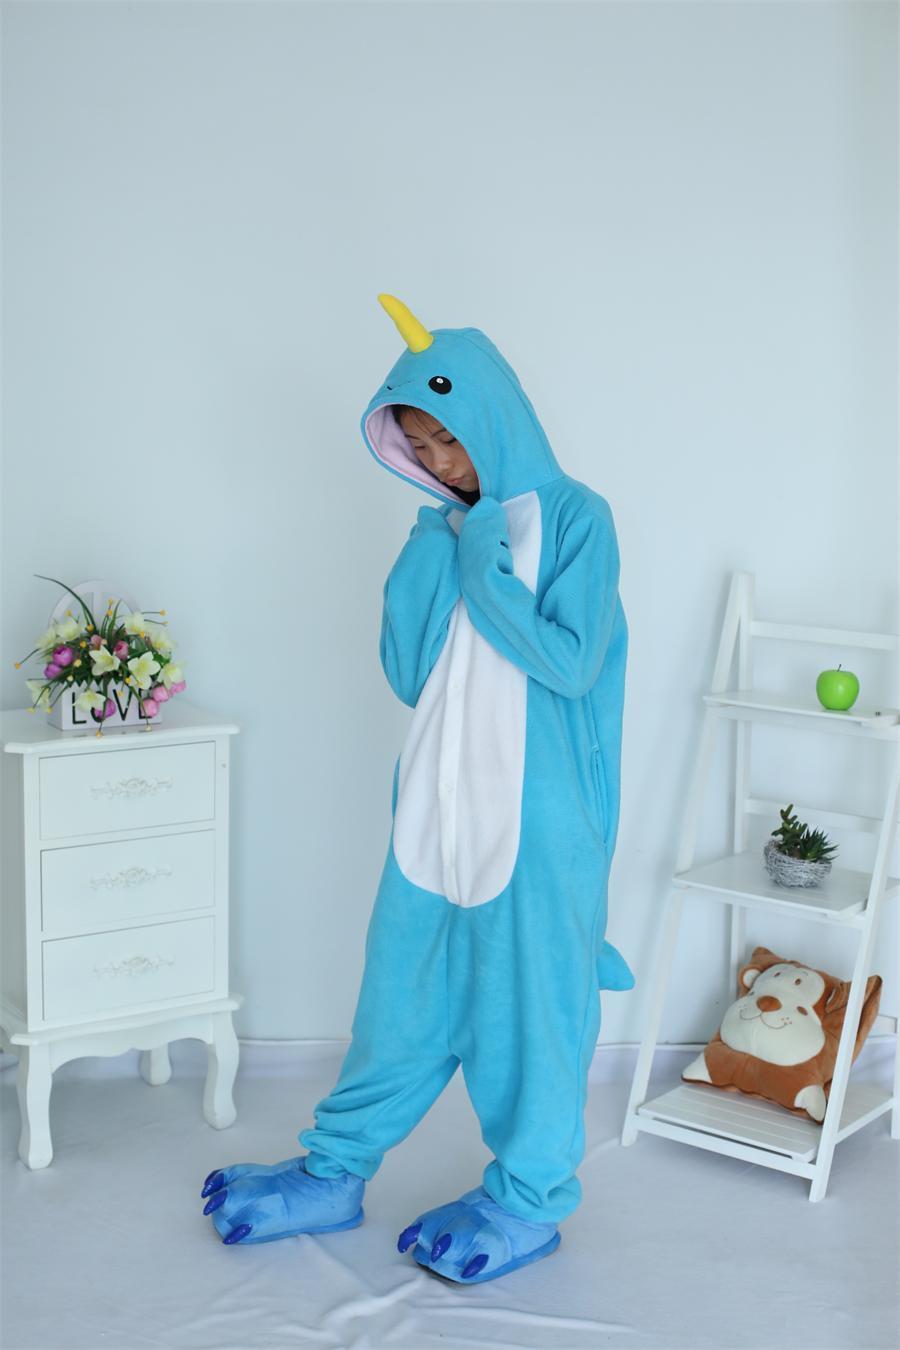 Cartoon Vuxen Unisex Djurdräkt Narwhal Onesie Whale Pajamas Fleece Sheep Pyjamas Djurkläder Cosplay Sleepwear